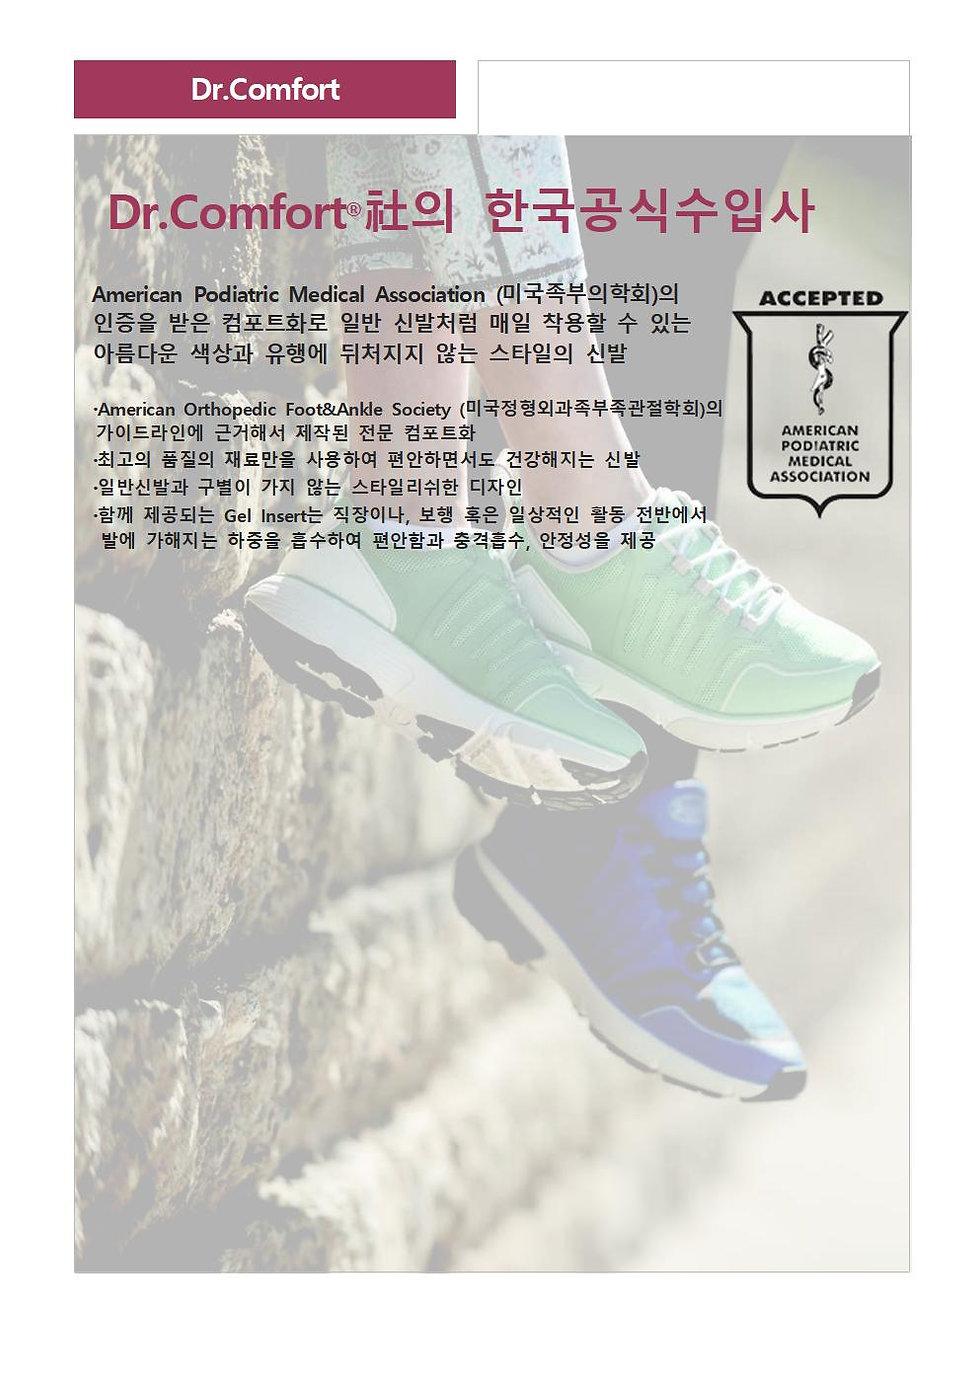 DrComfort.jpg